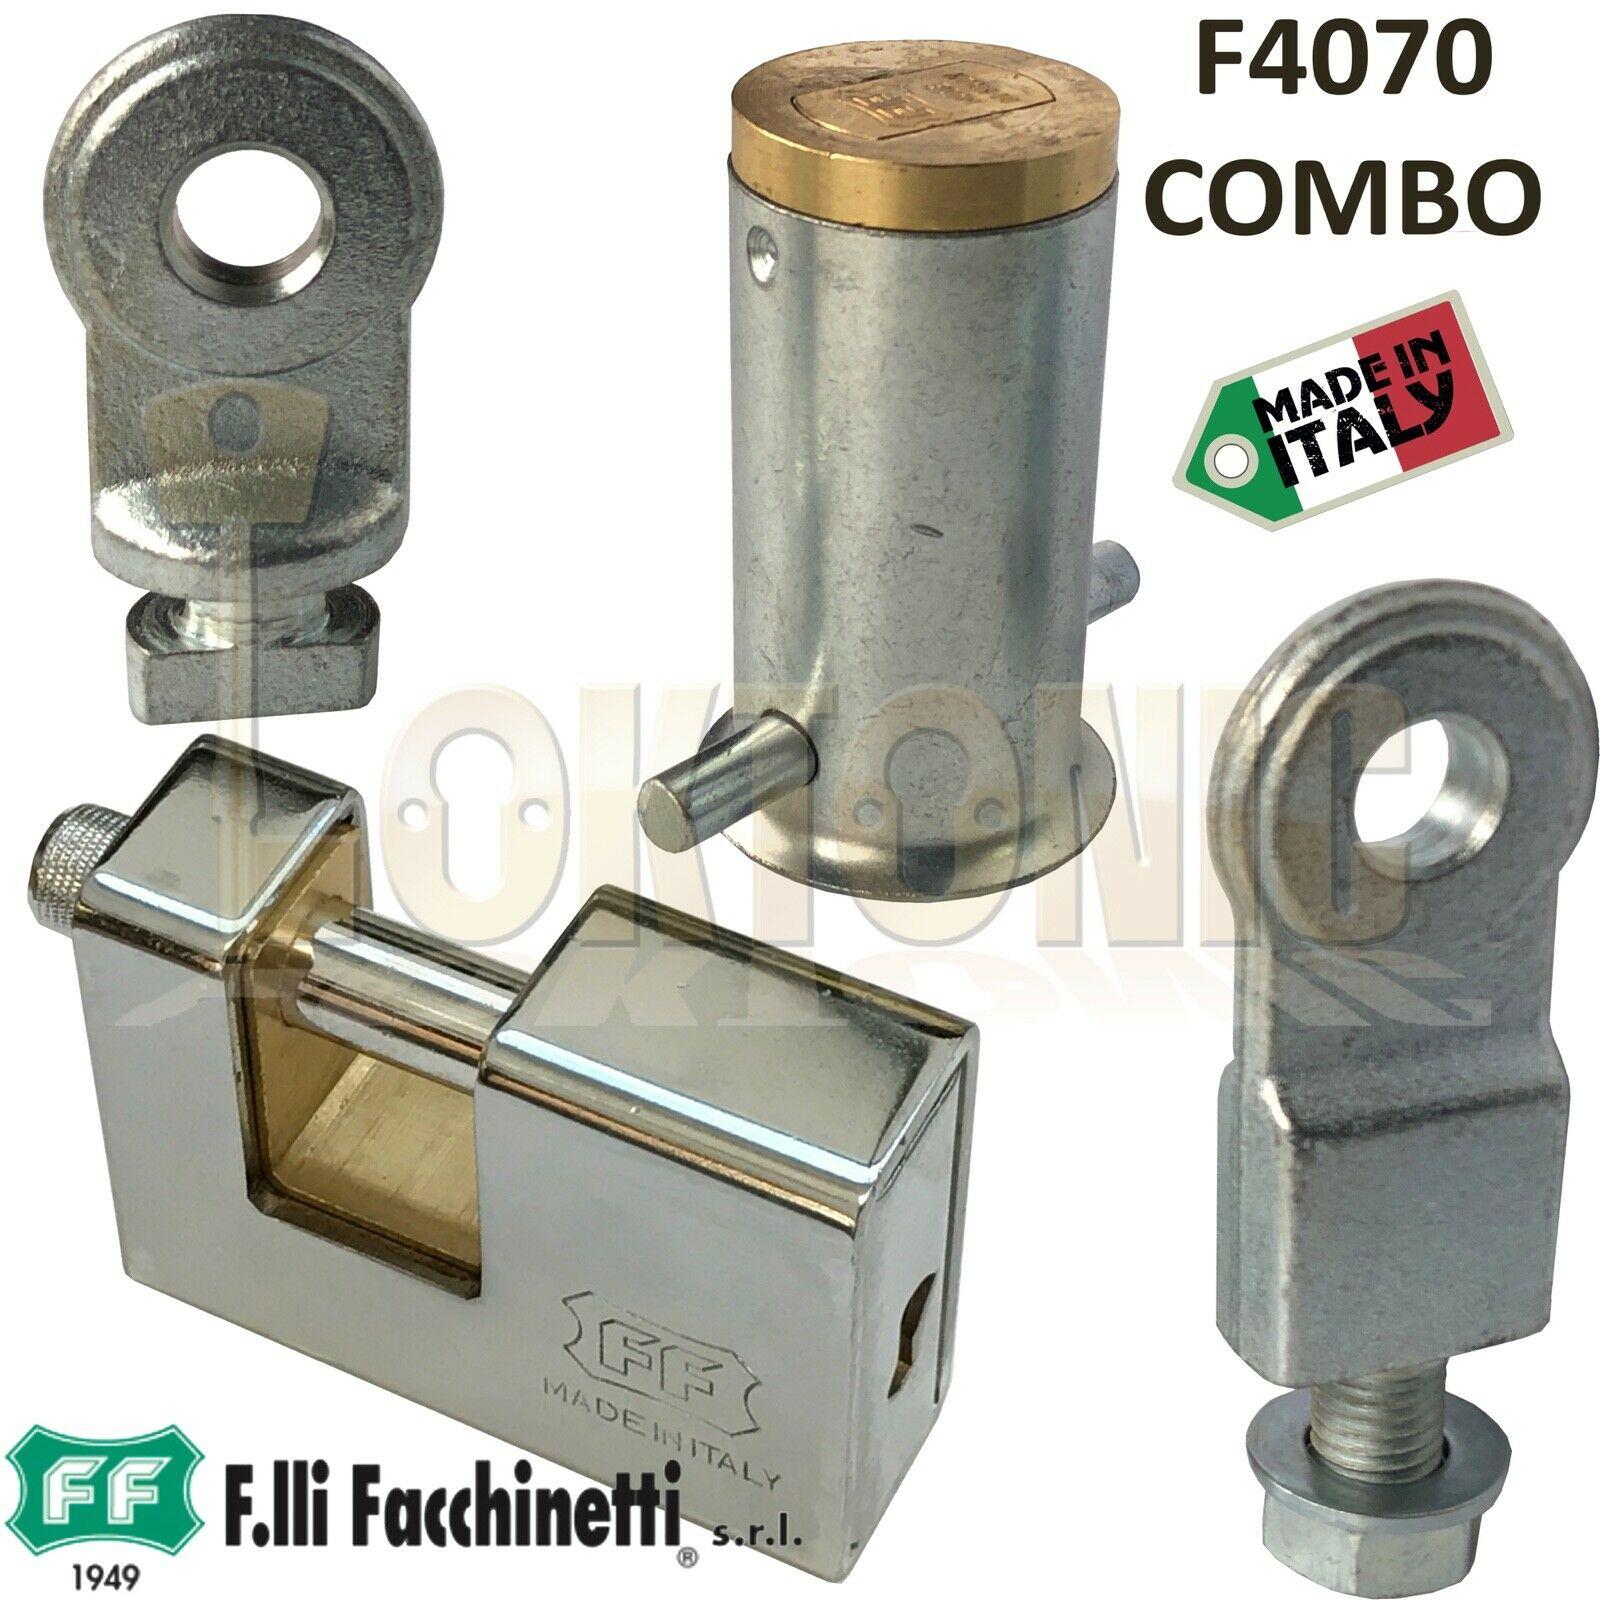 Facchinetti Heavy Duty Steel Roller Shutter Ground Anchor With Padlock 3  Keys